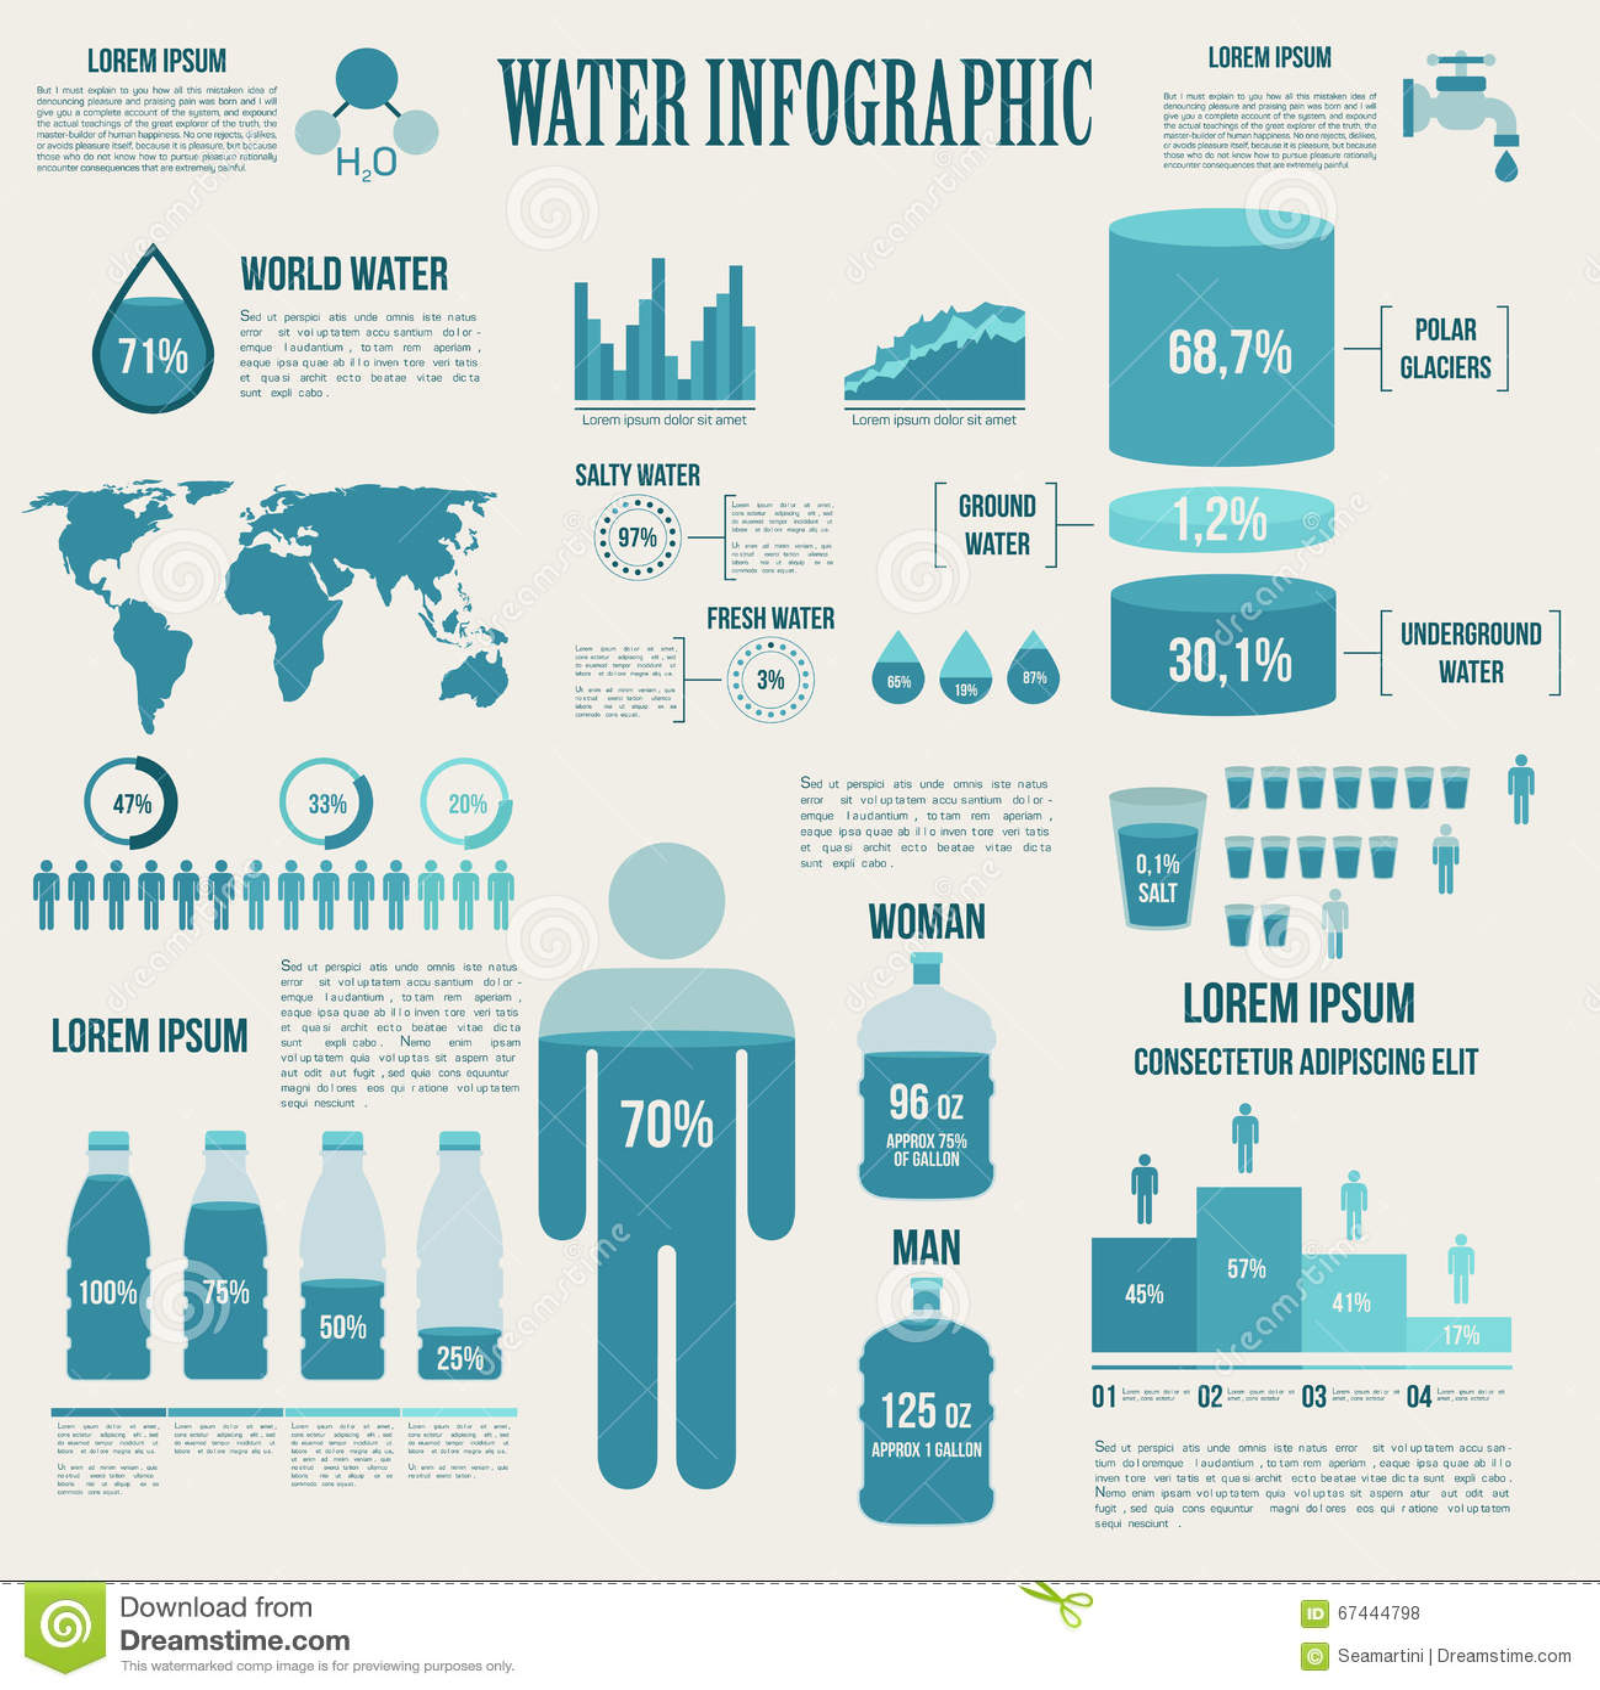 Video consumption infographic